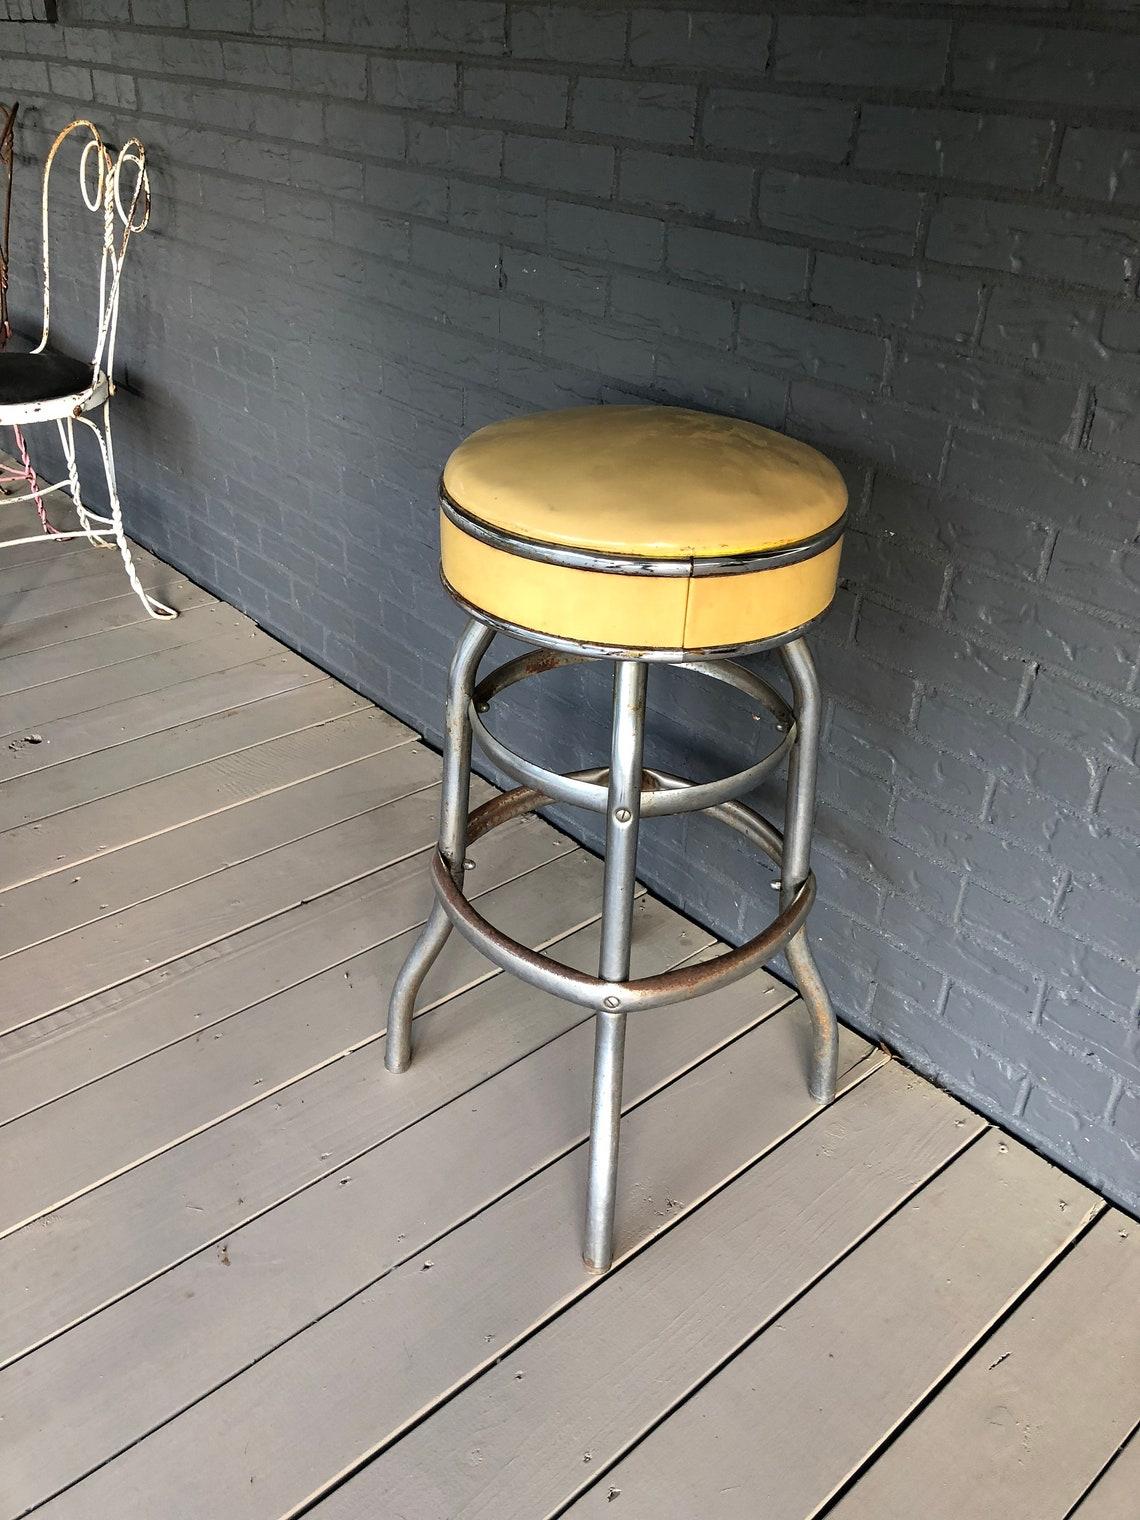 Vintage Swivel Diner Stool Soda Fountain Stool Mid Century Bar Stool Chrome and Vinyl Retro Decor